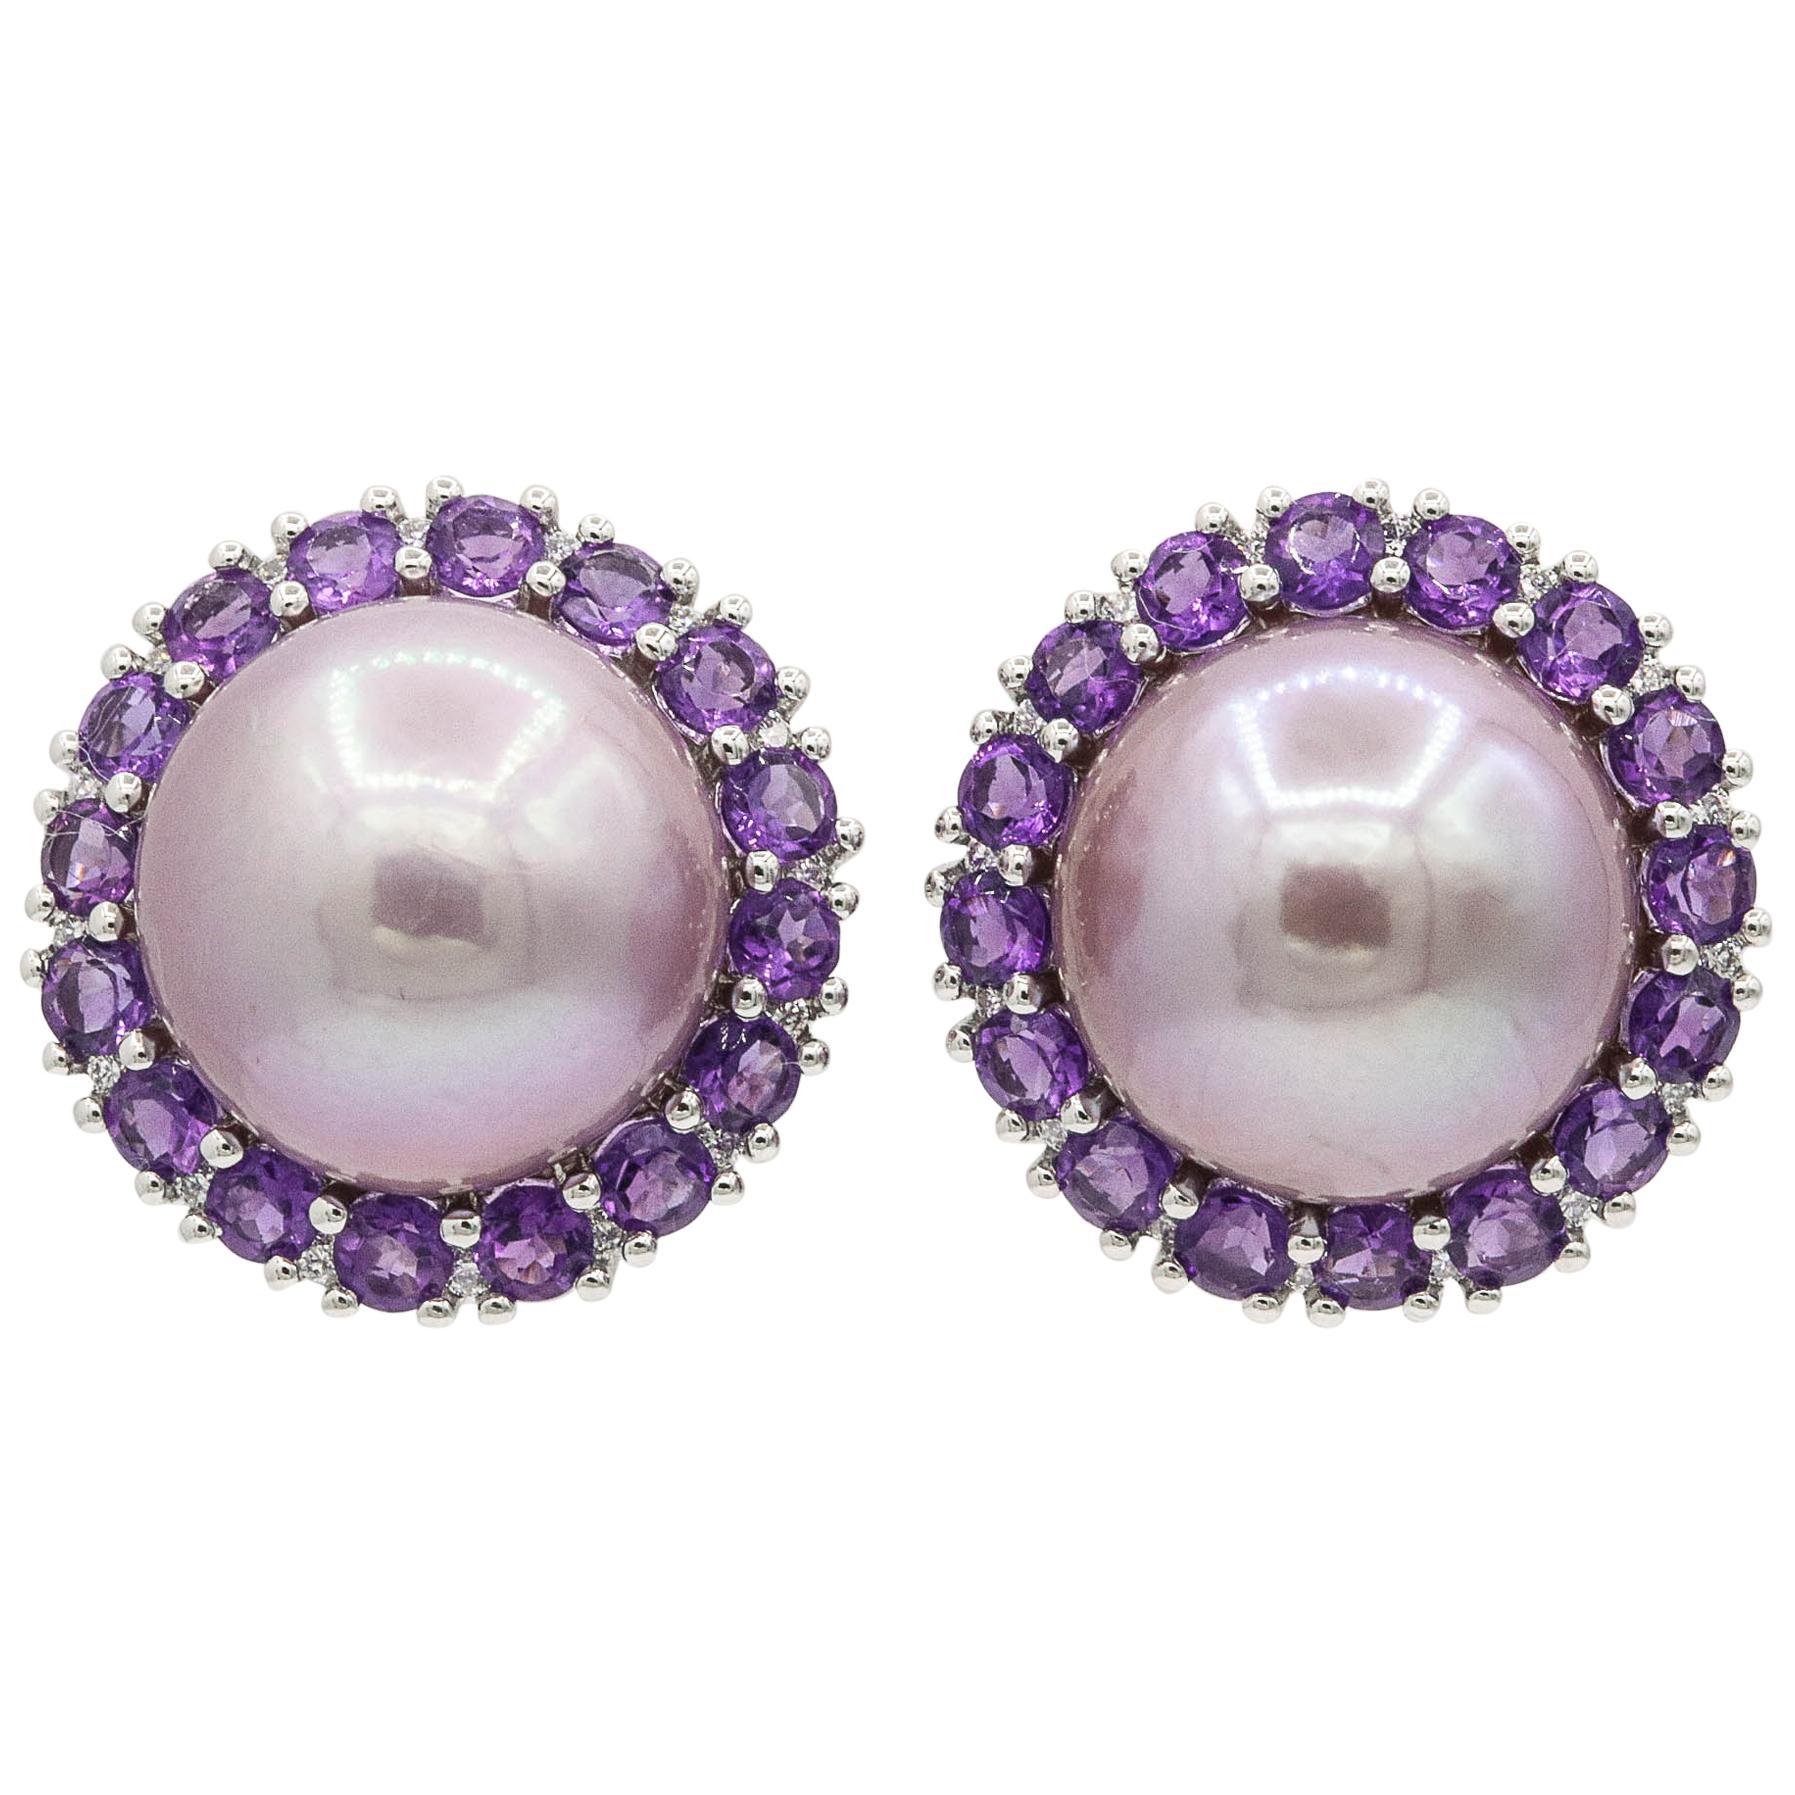 Amethyst and Pink Freshwater Pearl Diamond Studs Earrings